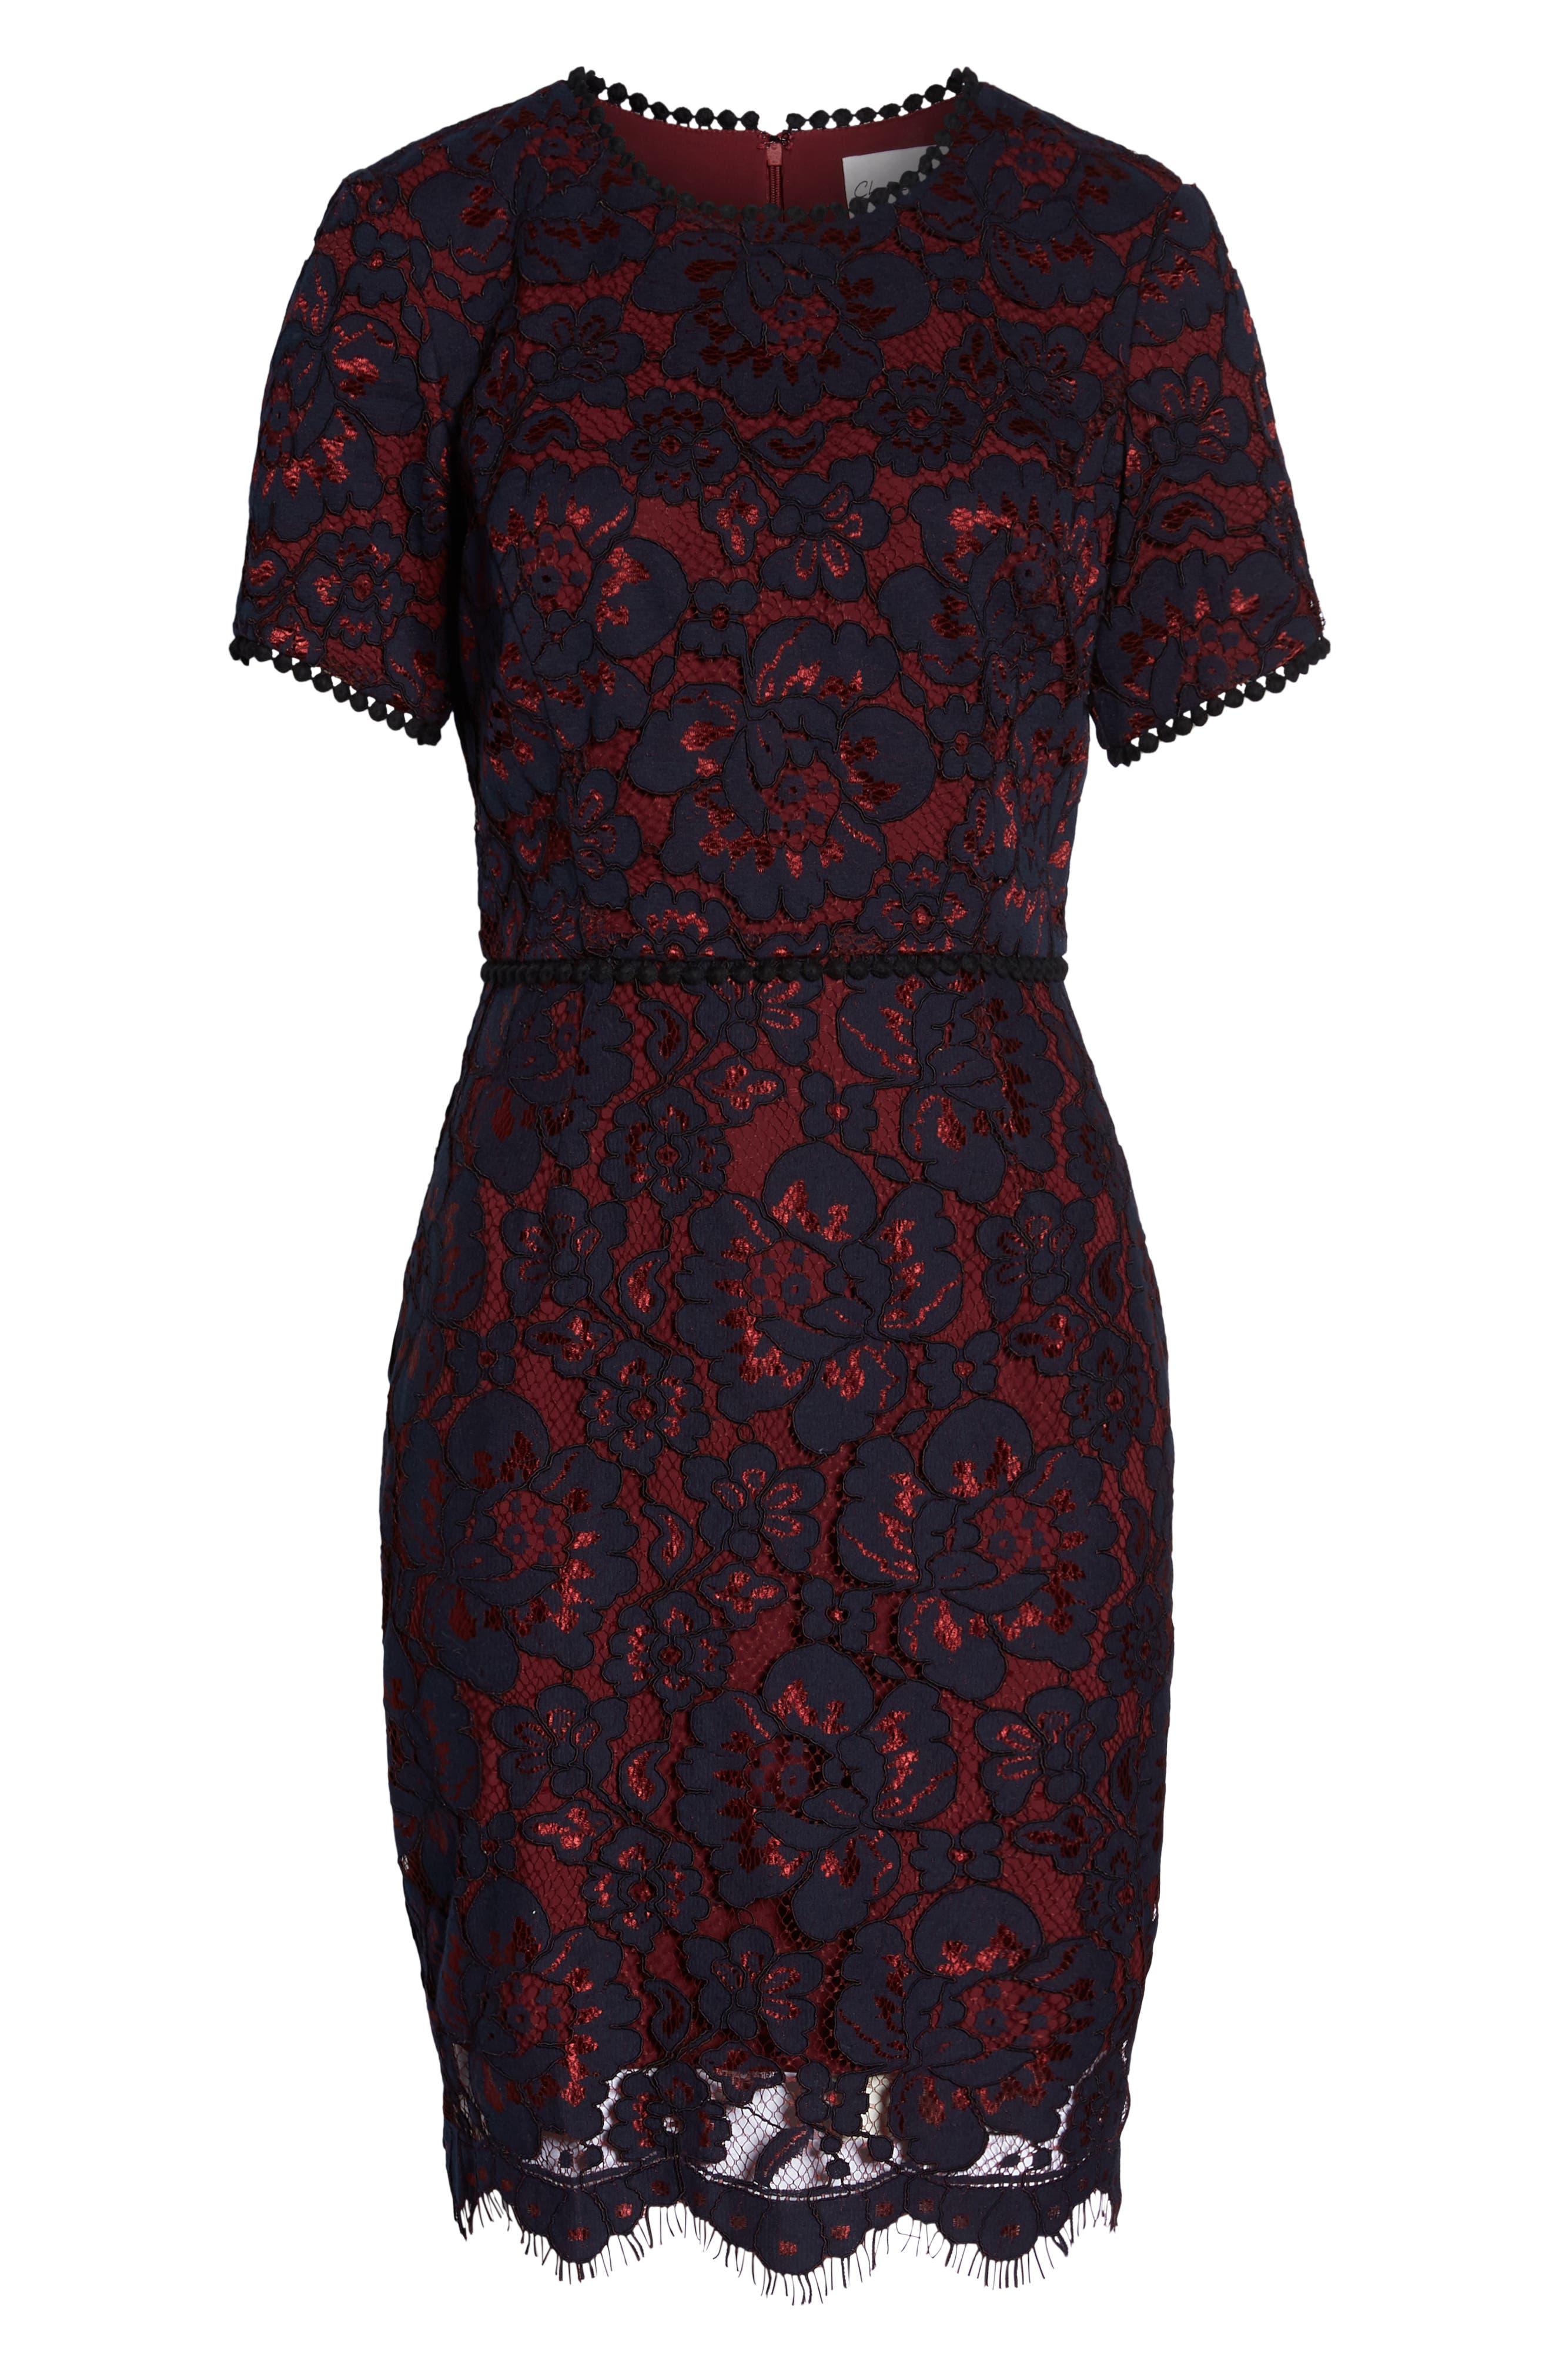 Lace Sheath Dress,                             Alternate thumbnail 7, color,                             NAVY/ WINE LACE